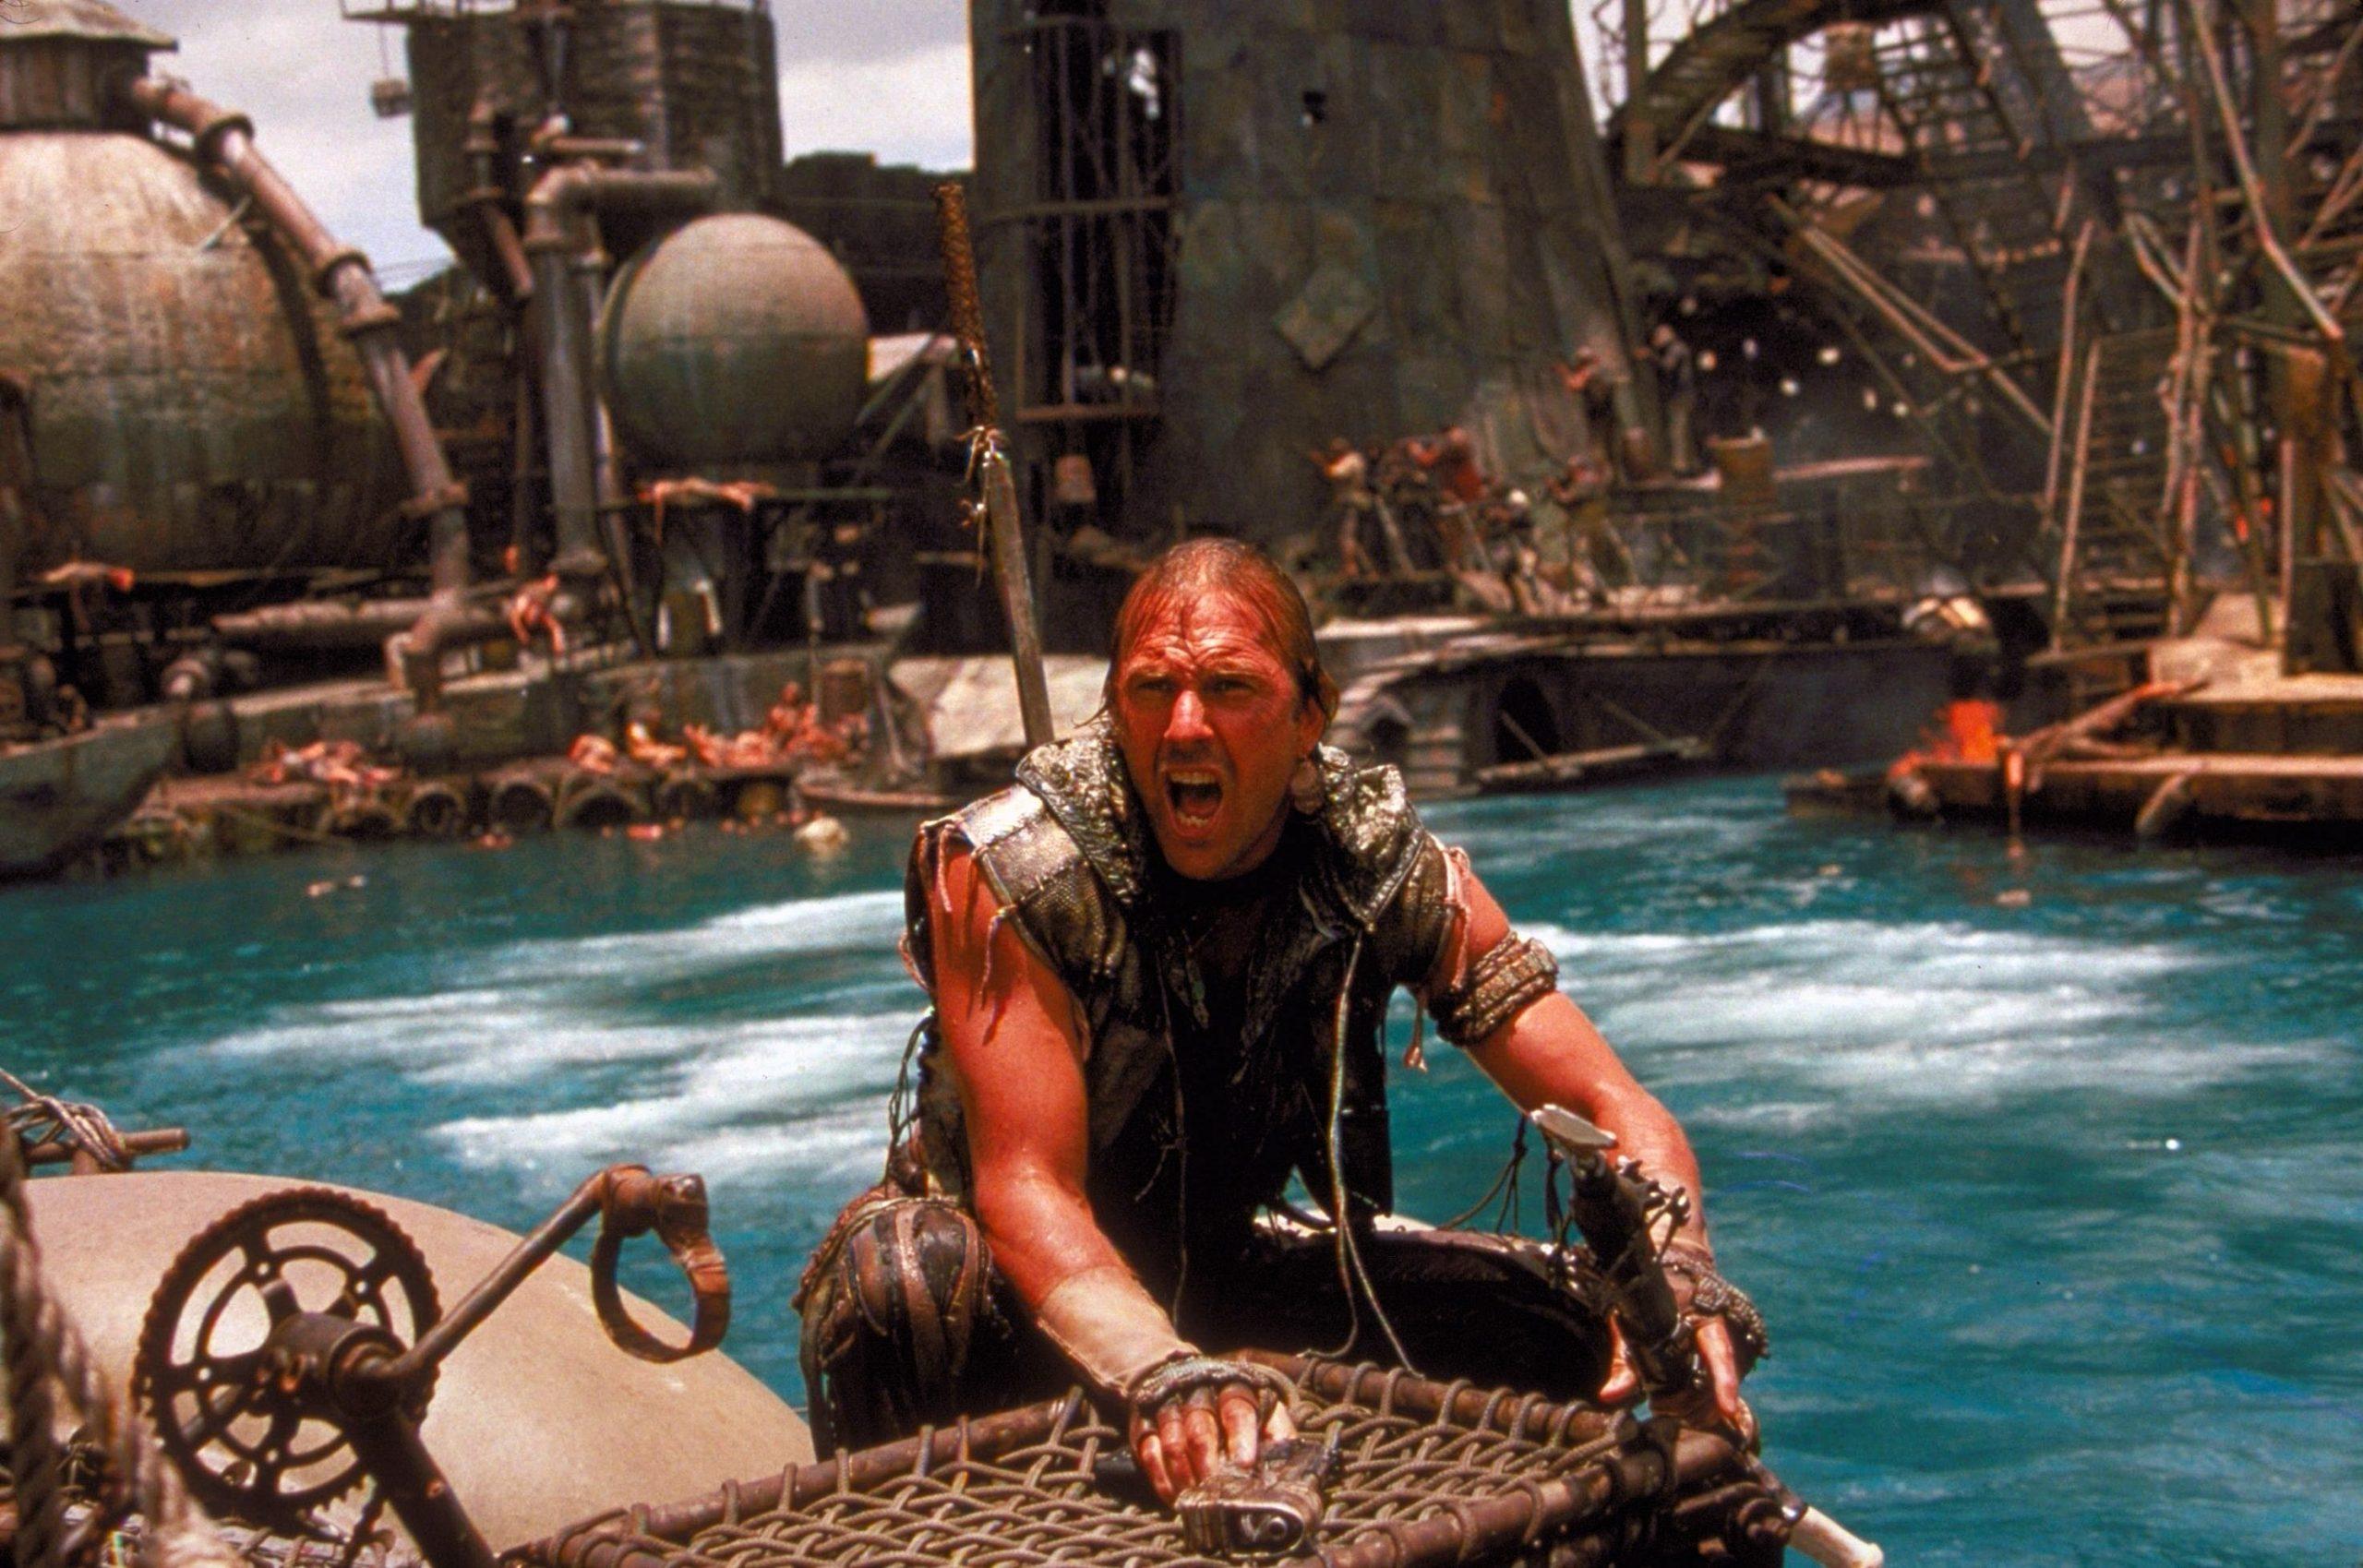 We're Stuck in Kevin Costner's Waterworld